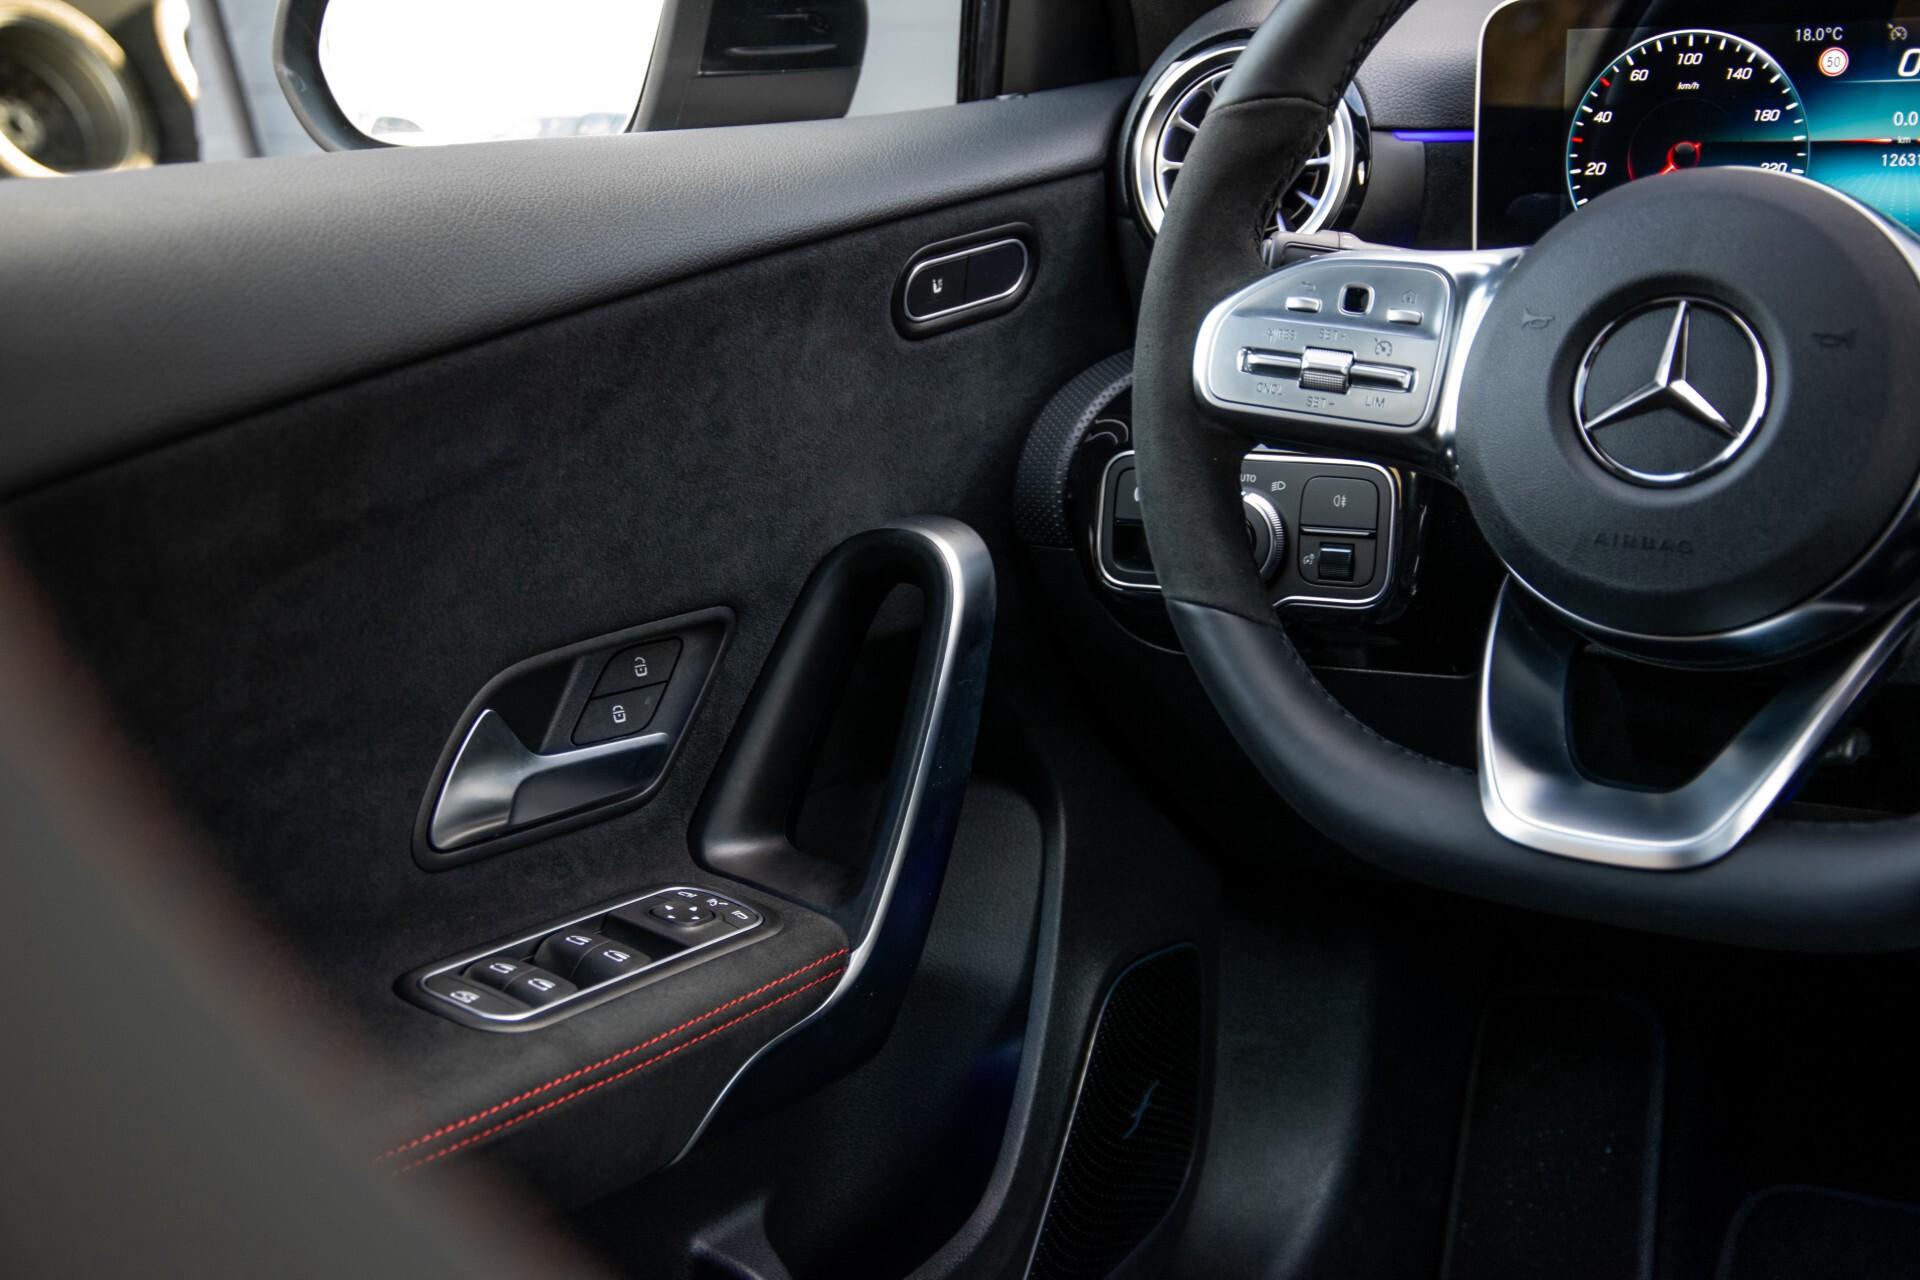 Mercedes-Benz A-Klasse 250 4-M AMG Panorama/Keyless-Entry/MBUX/HUD/Burmester/360/Multibeam LED Aut7 Foto 47